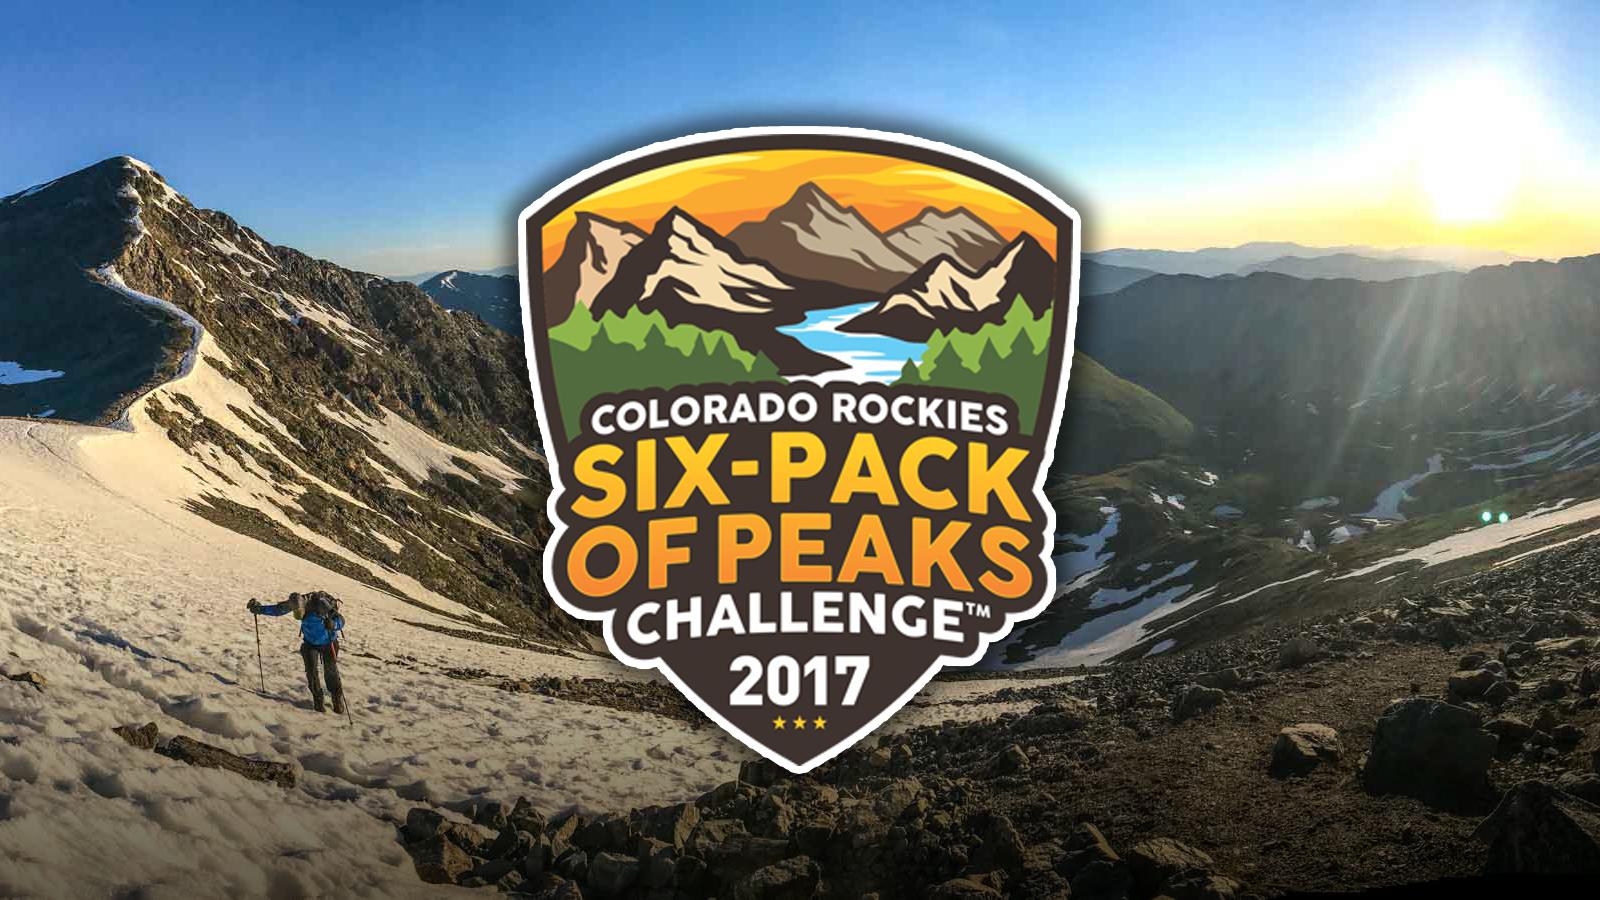 Announcing the Inaugural Colorado Rockies Six-Pack of Peaks Challenge™